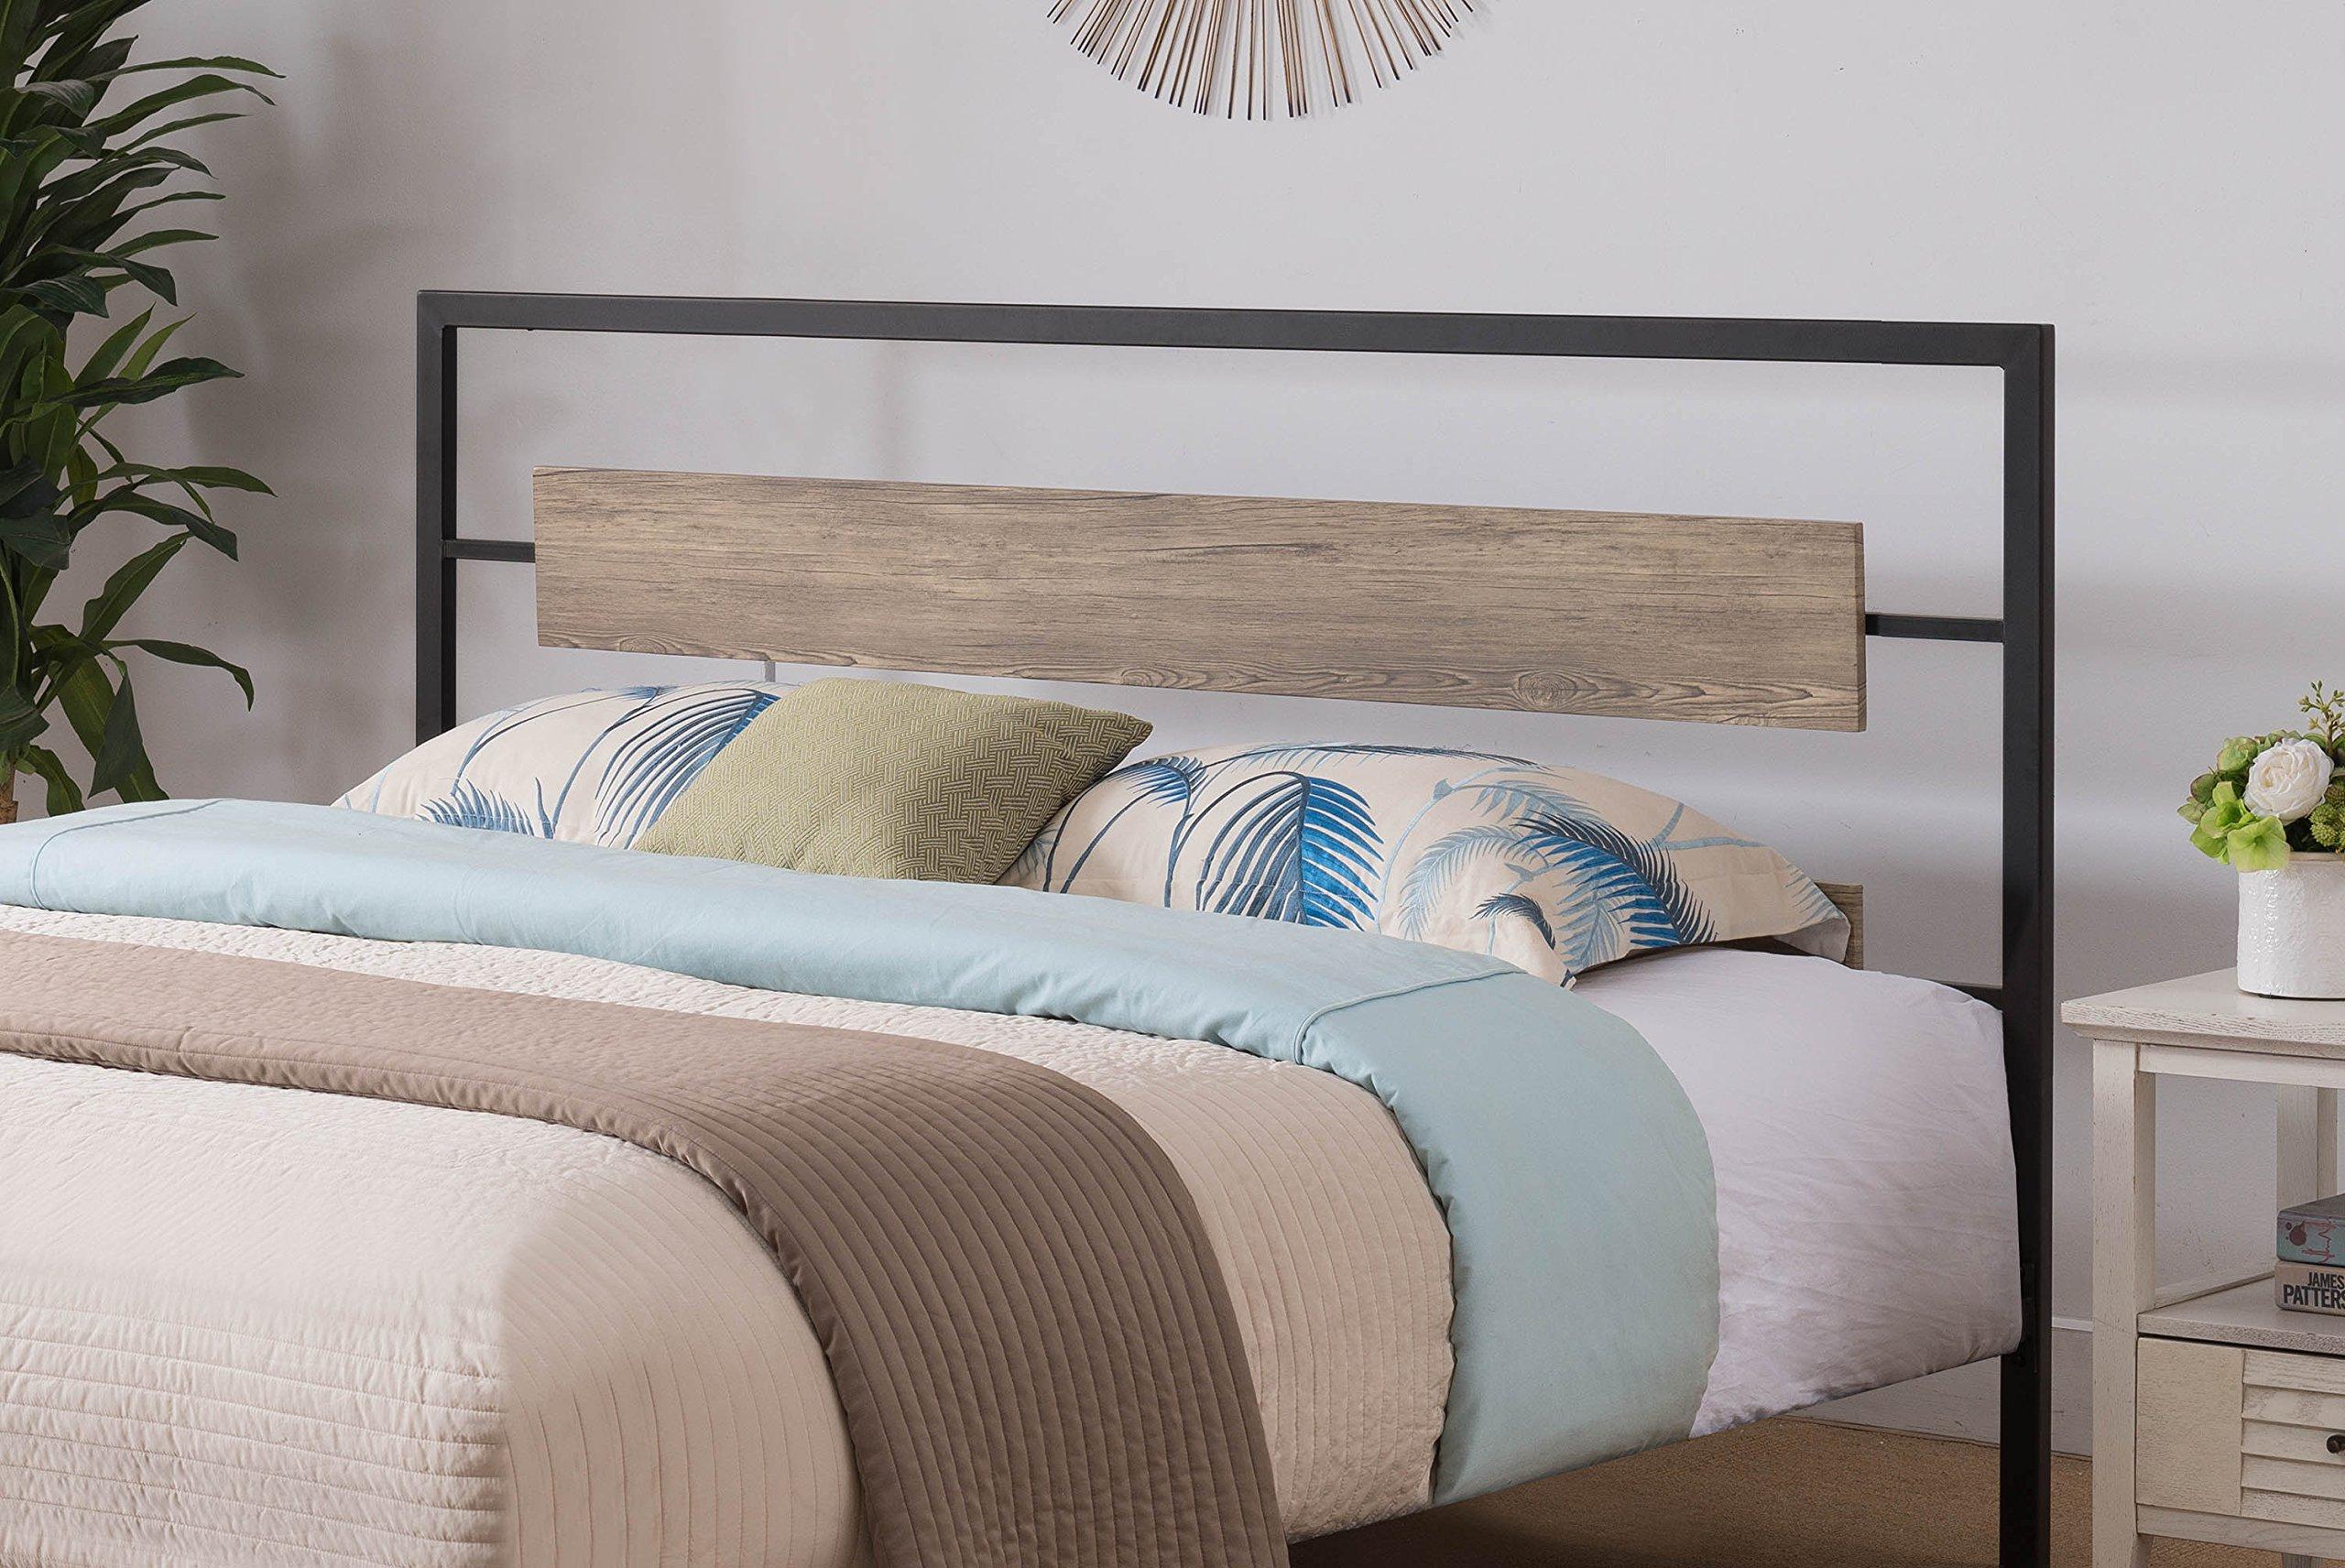 Kings Brand Furniture - Verona Pewter Metal/Gray Wood Twin Size Headboard by Kings Brand Furniture